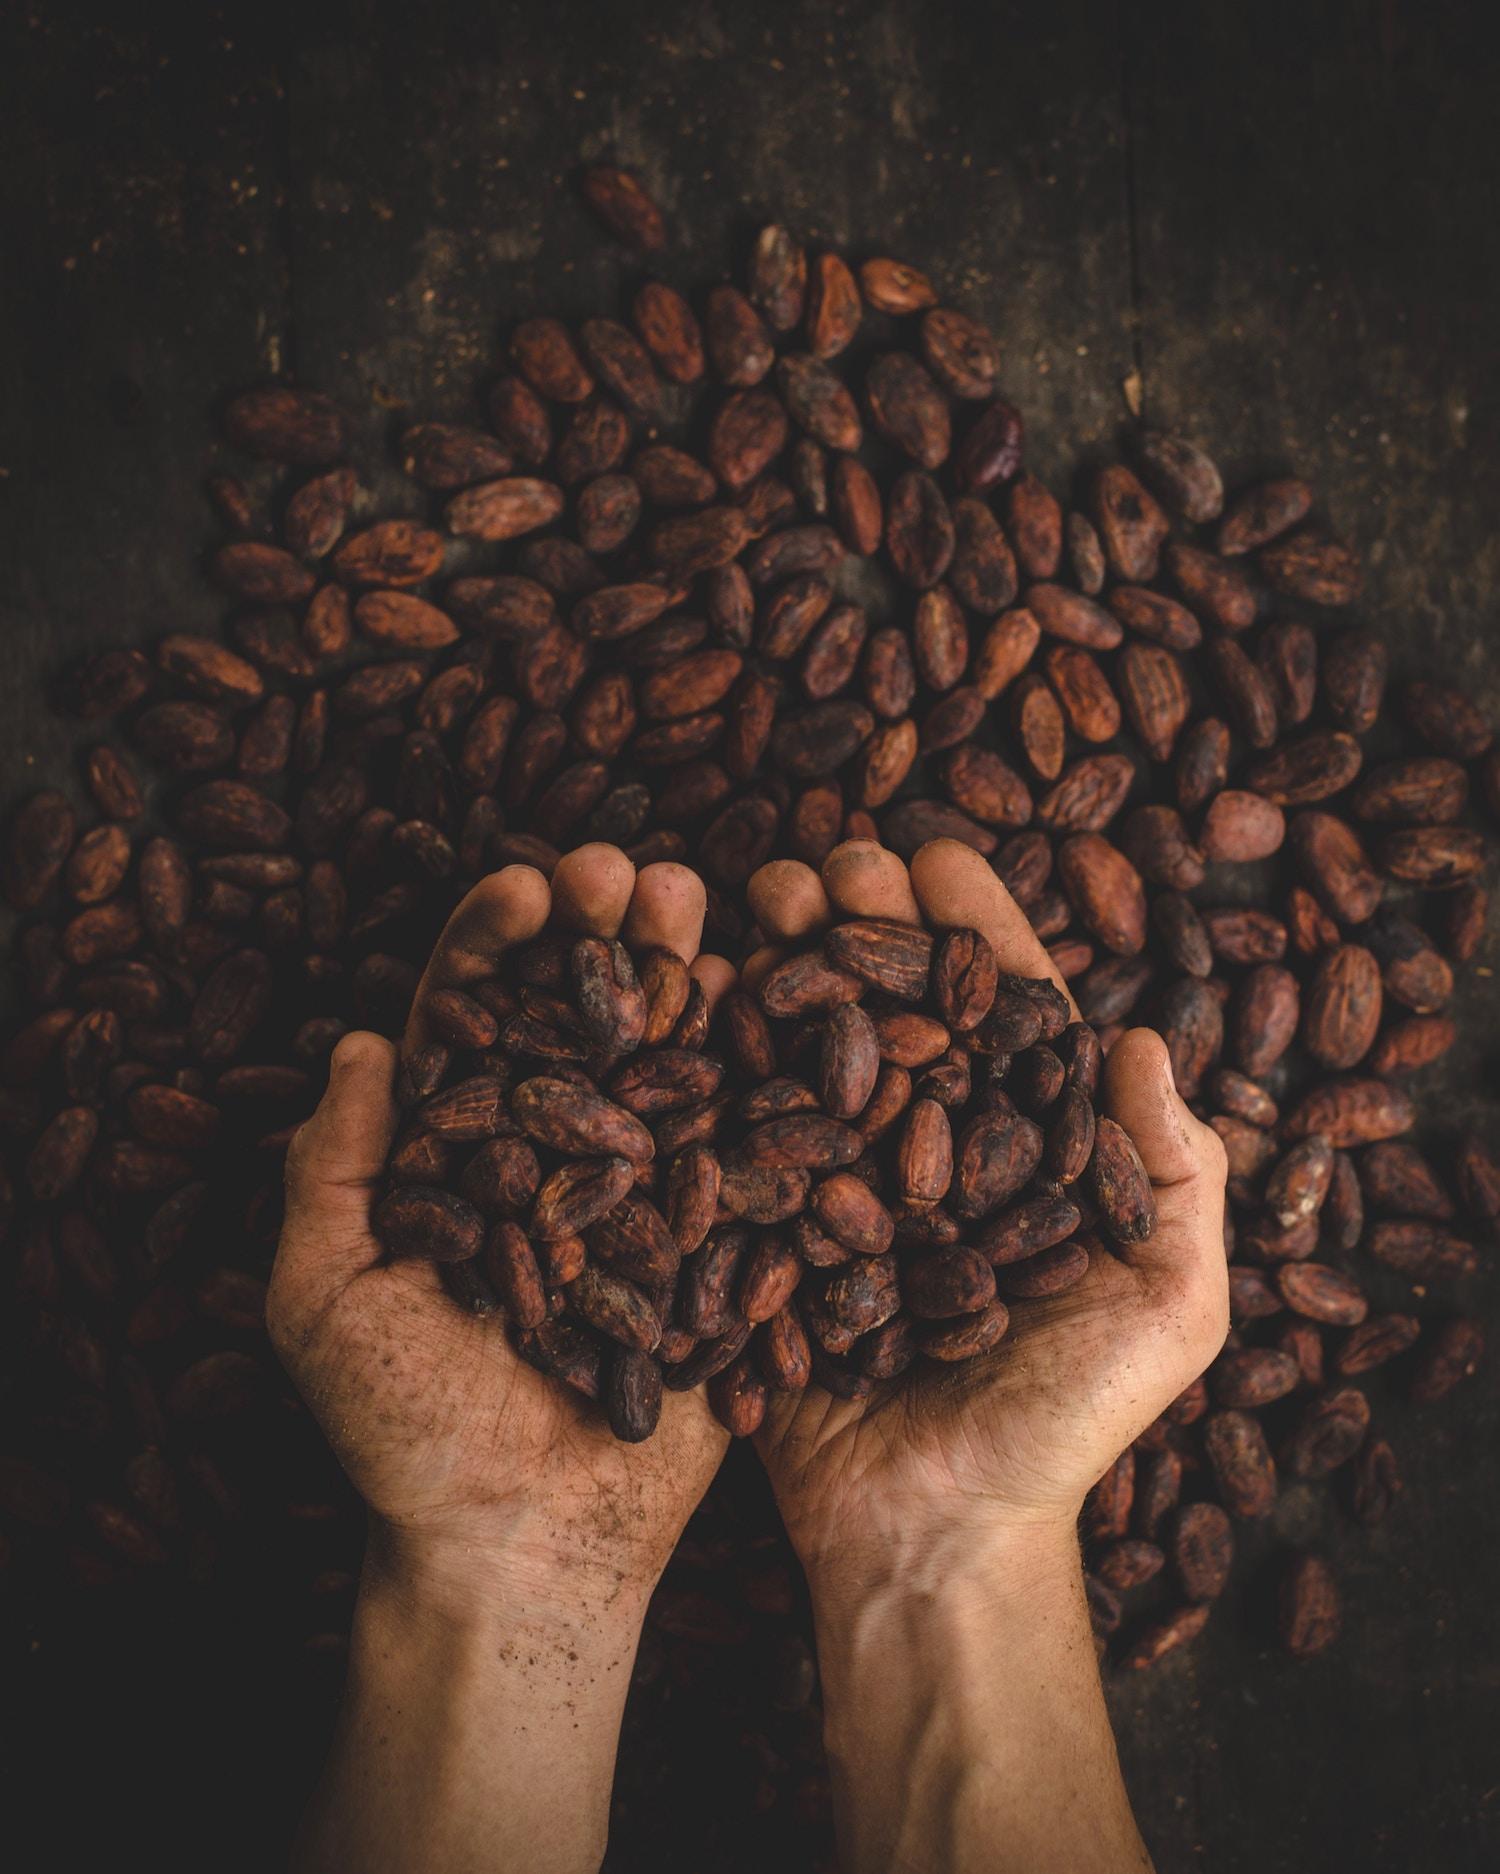 Cacao cacaophony: Pablo Merchan Montes, Unsplash.